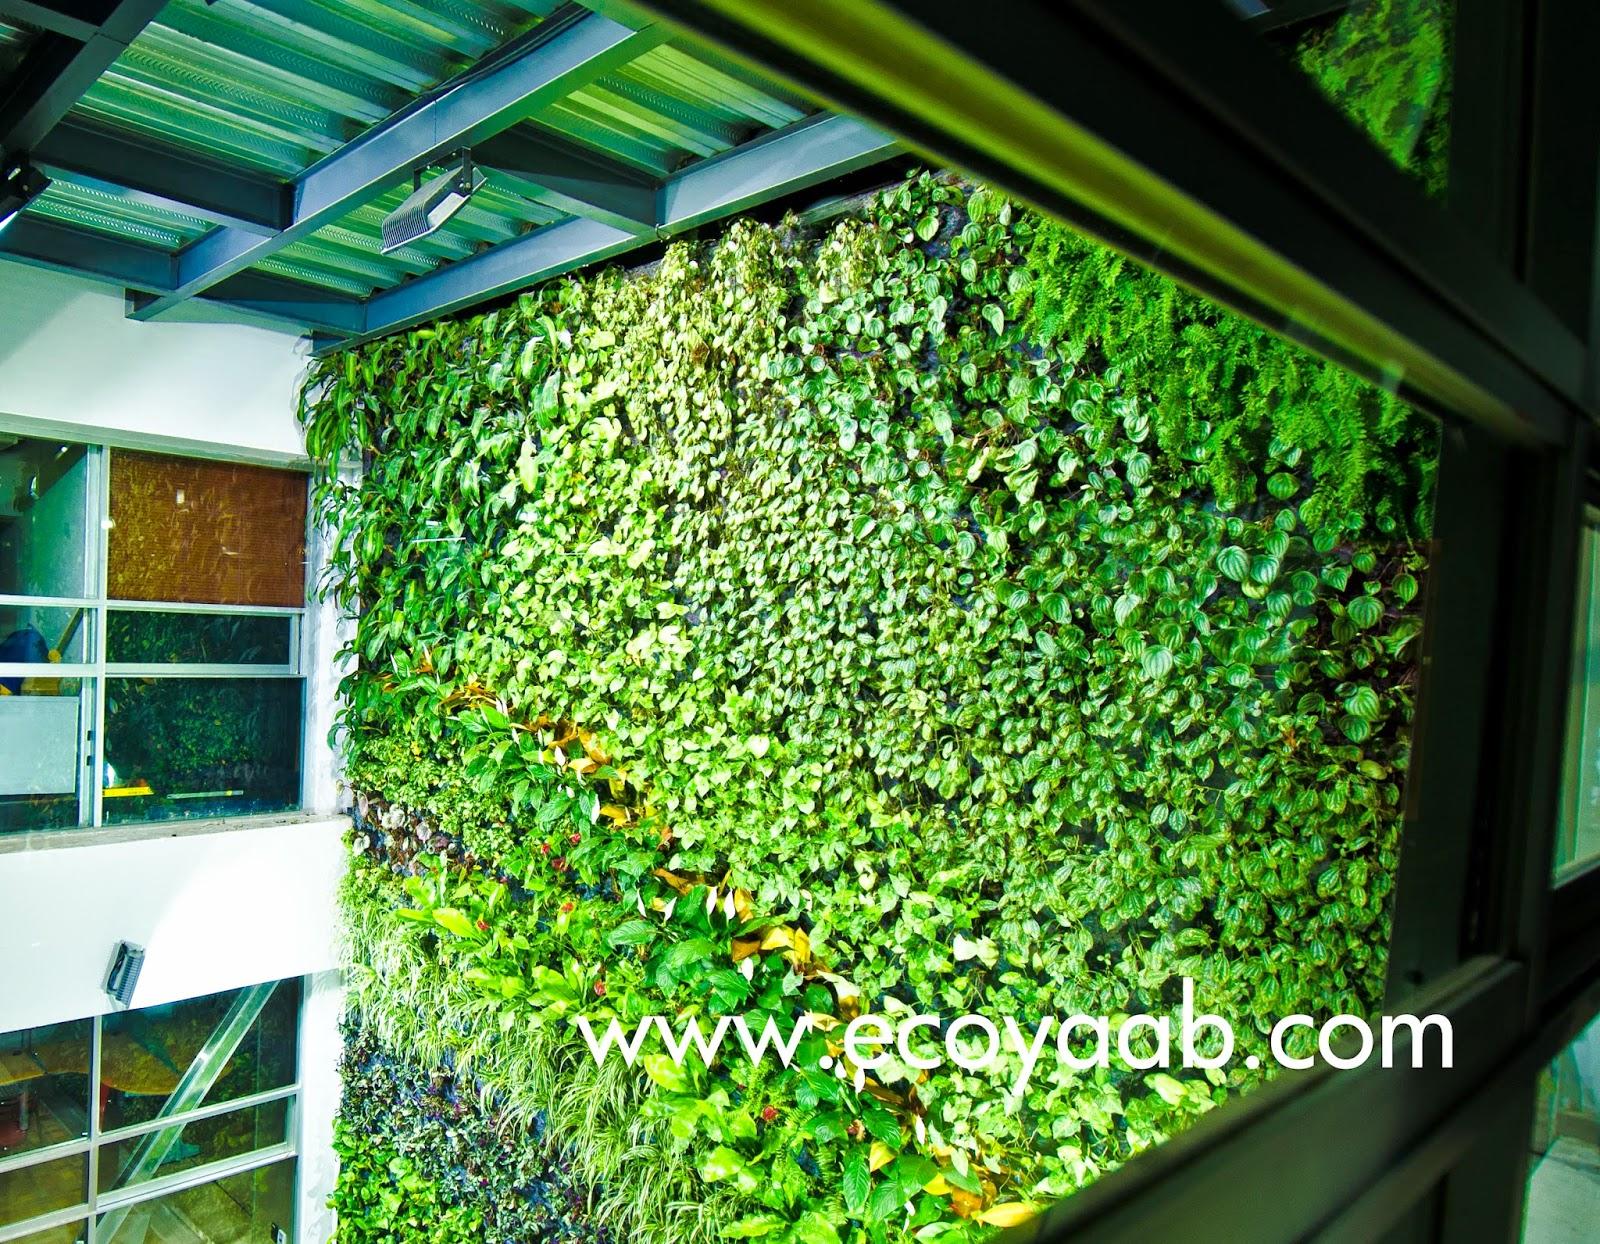 Ecoyaab mi jard n urbano for Muros verdes beneficios